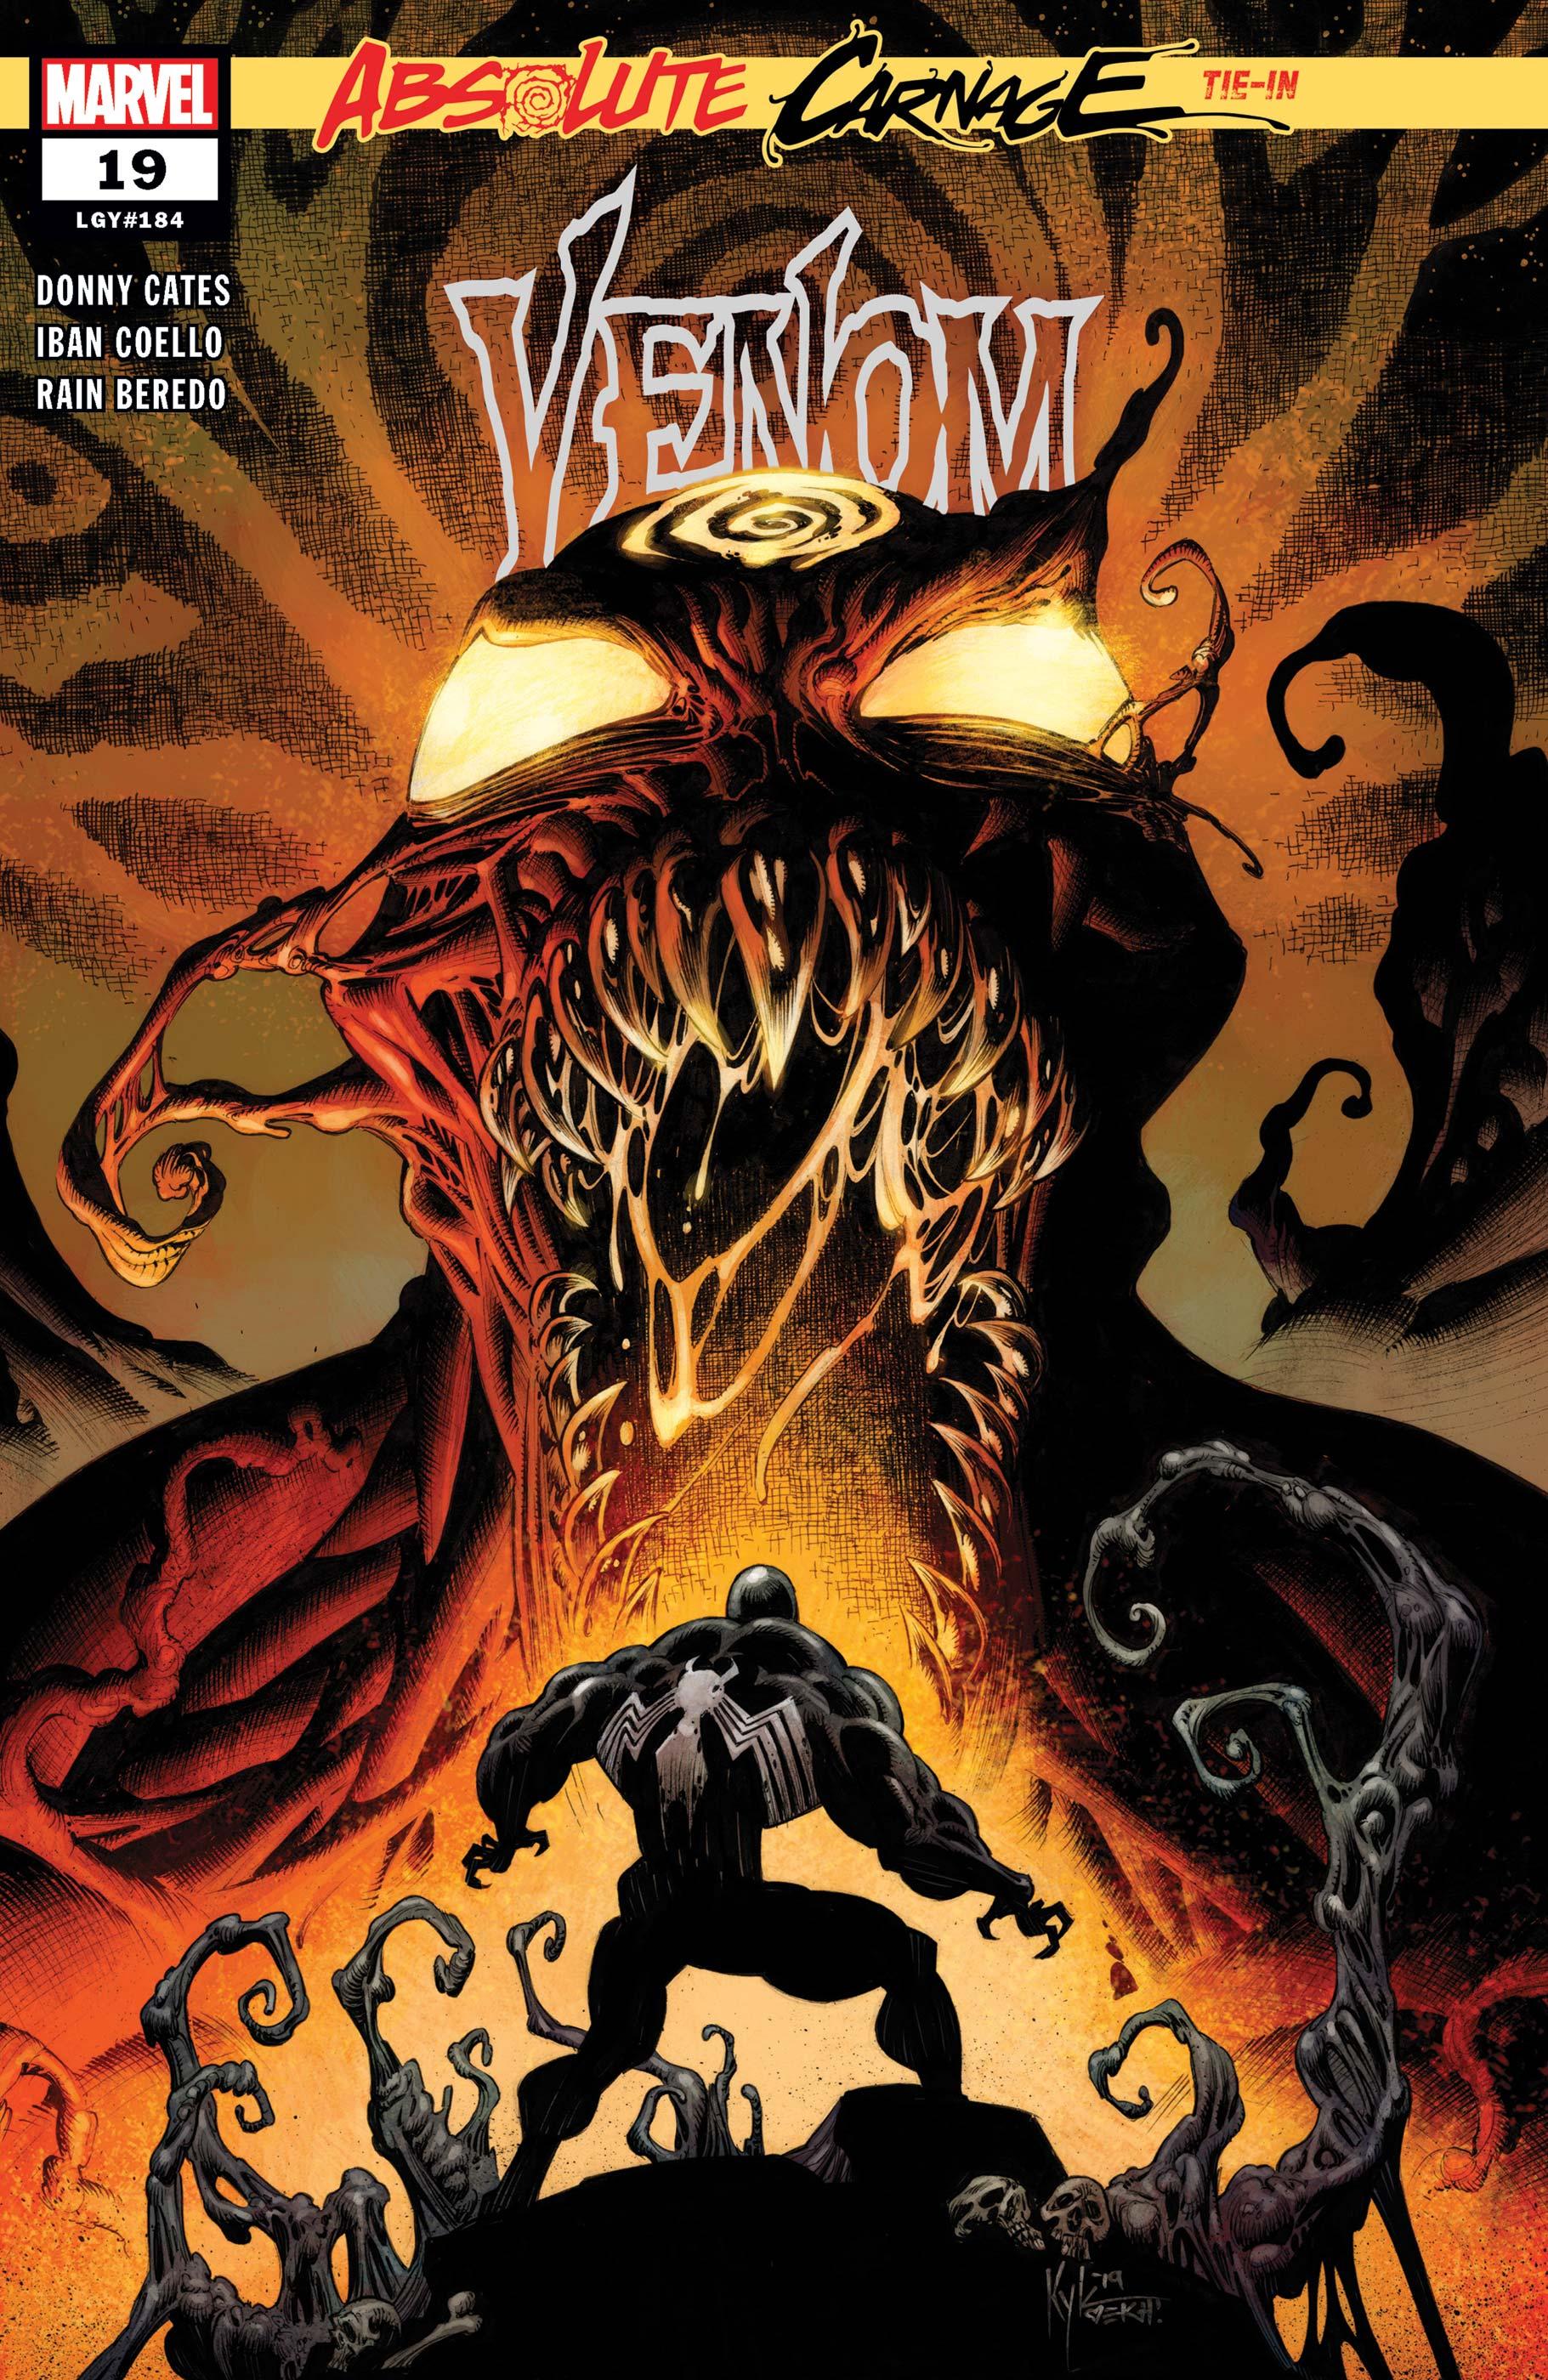 Venom (2018) #19